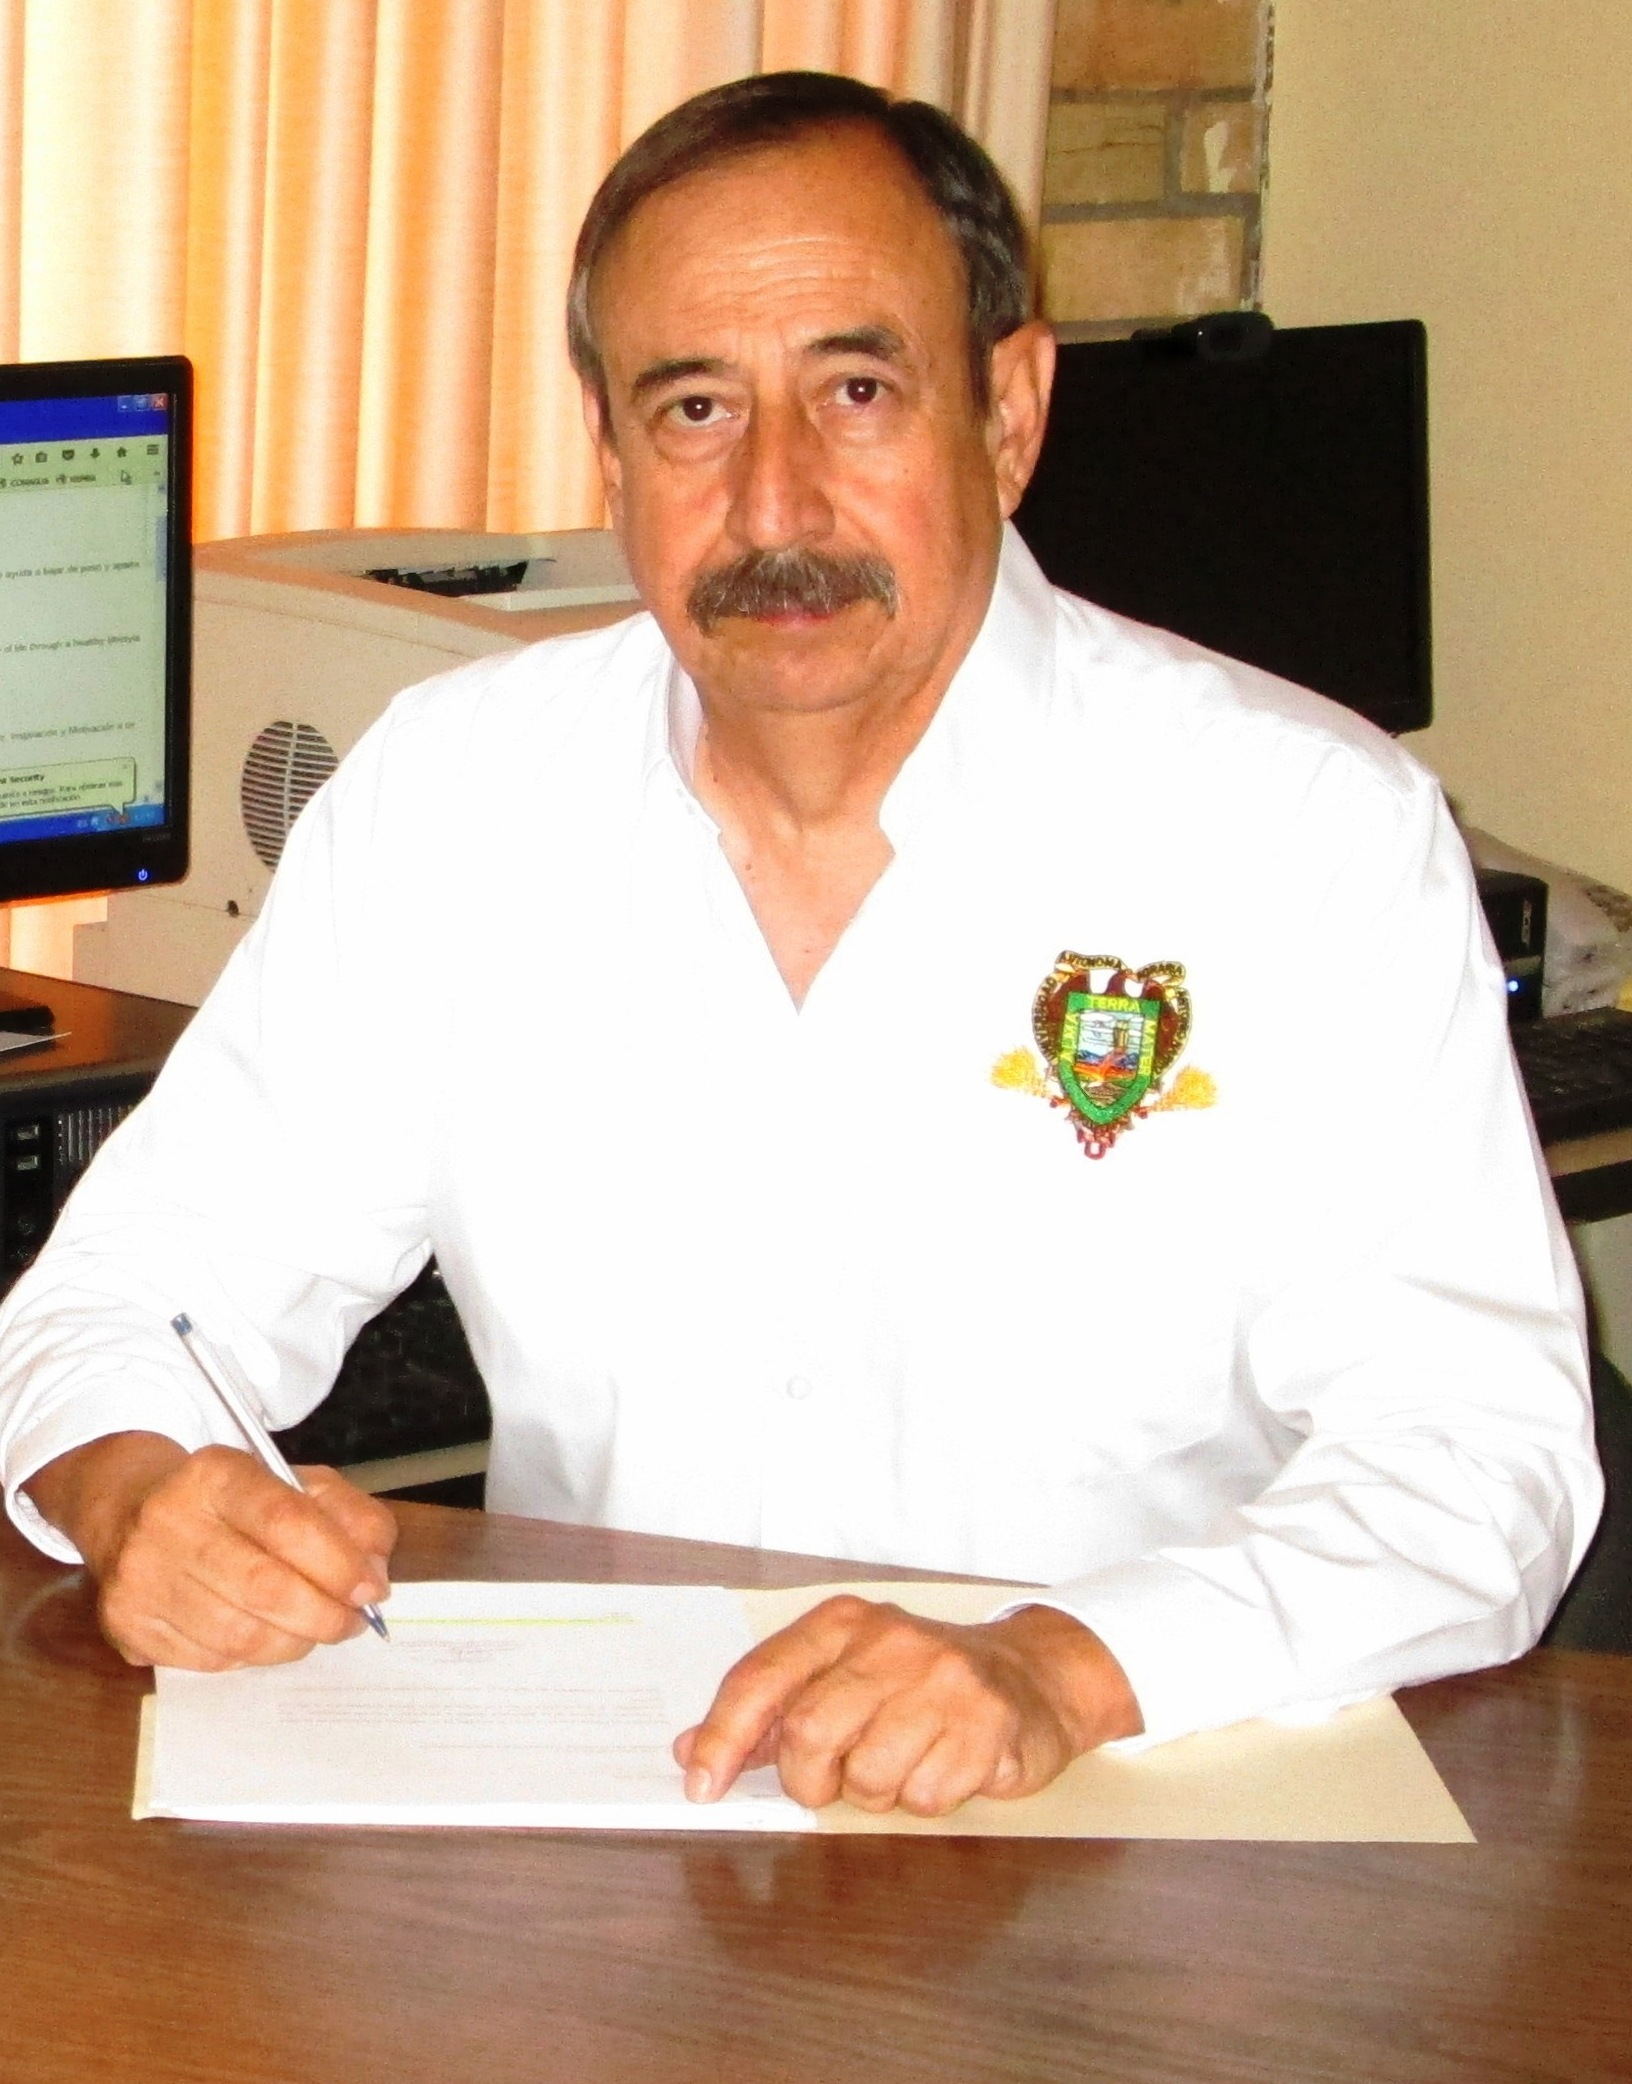 Román Clemente García Gómez